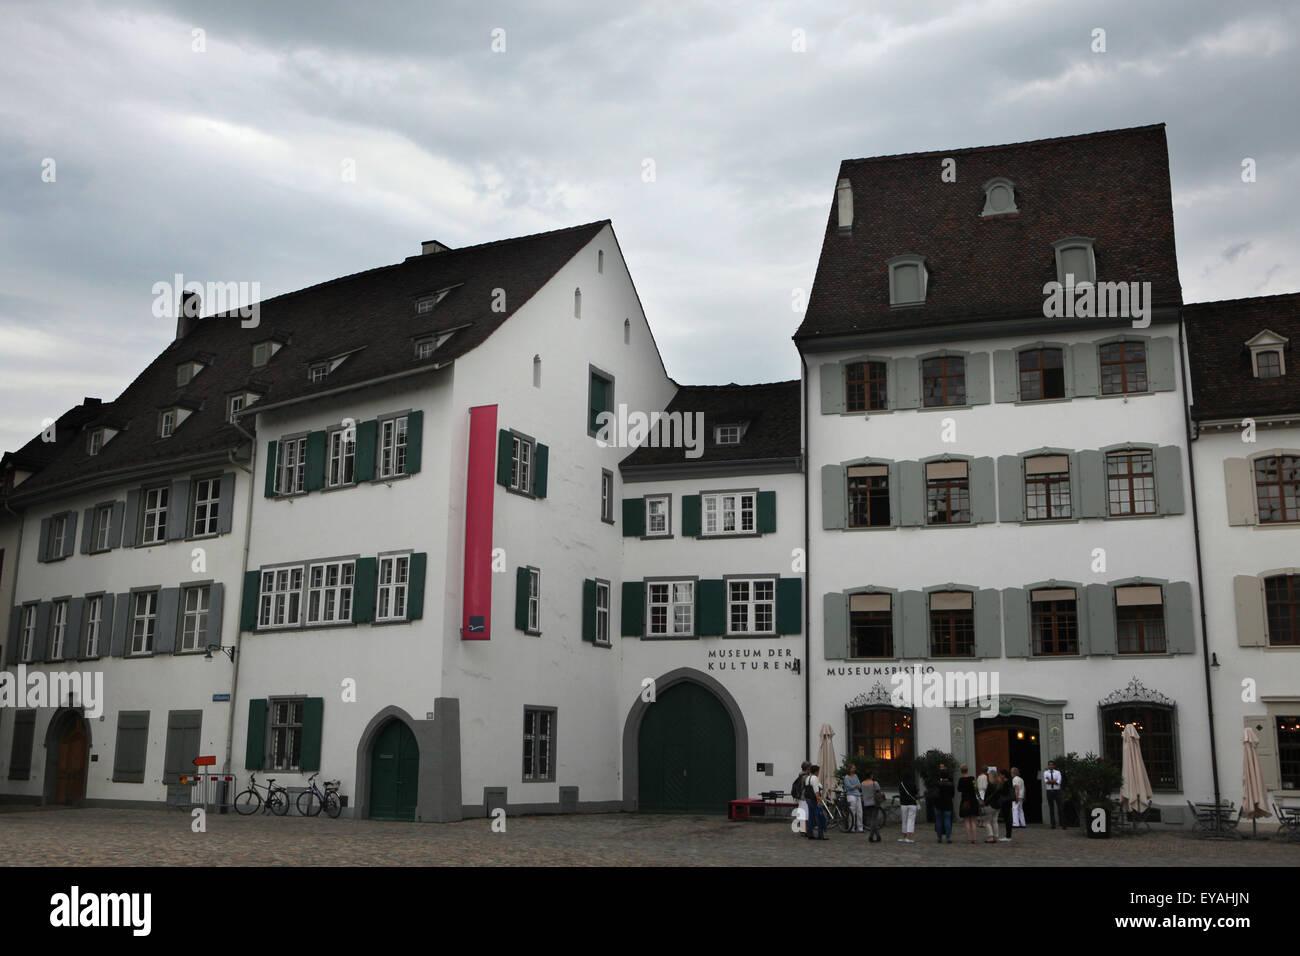 Museum der Kulturen (Museo delle Culture) al Münsterplatz a Basilea in Svizzera. Immagini Stock